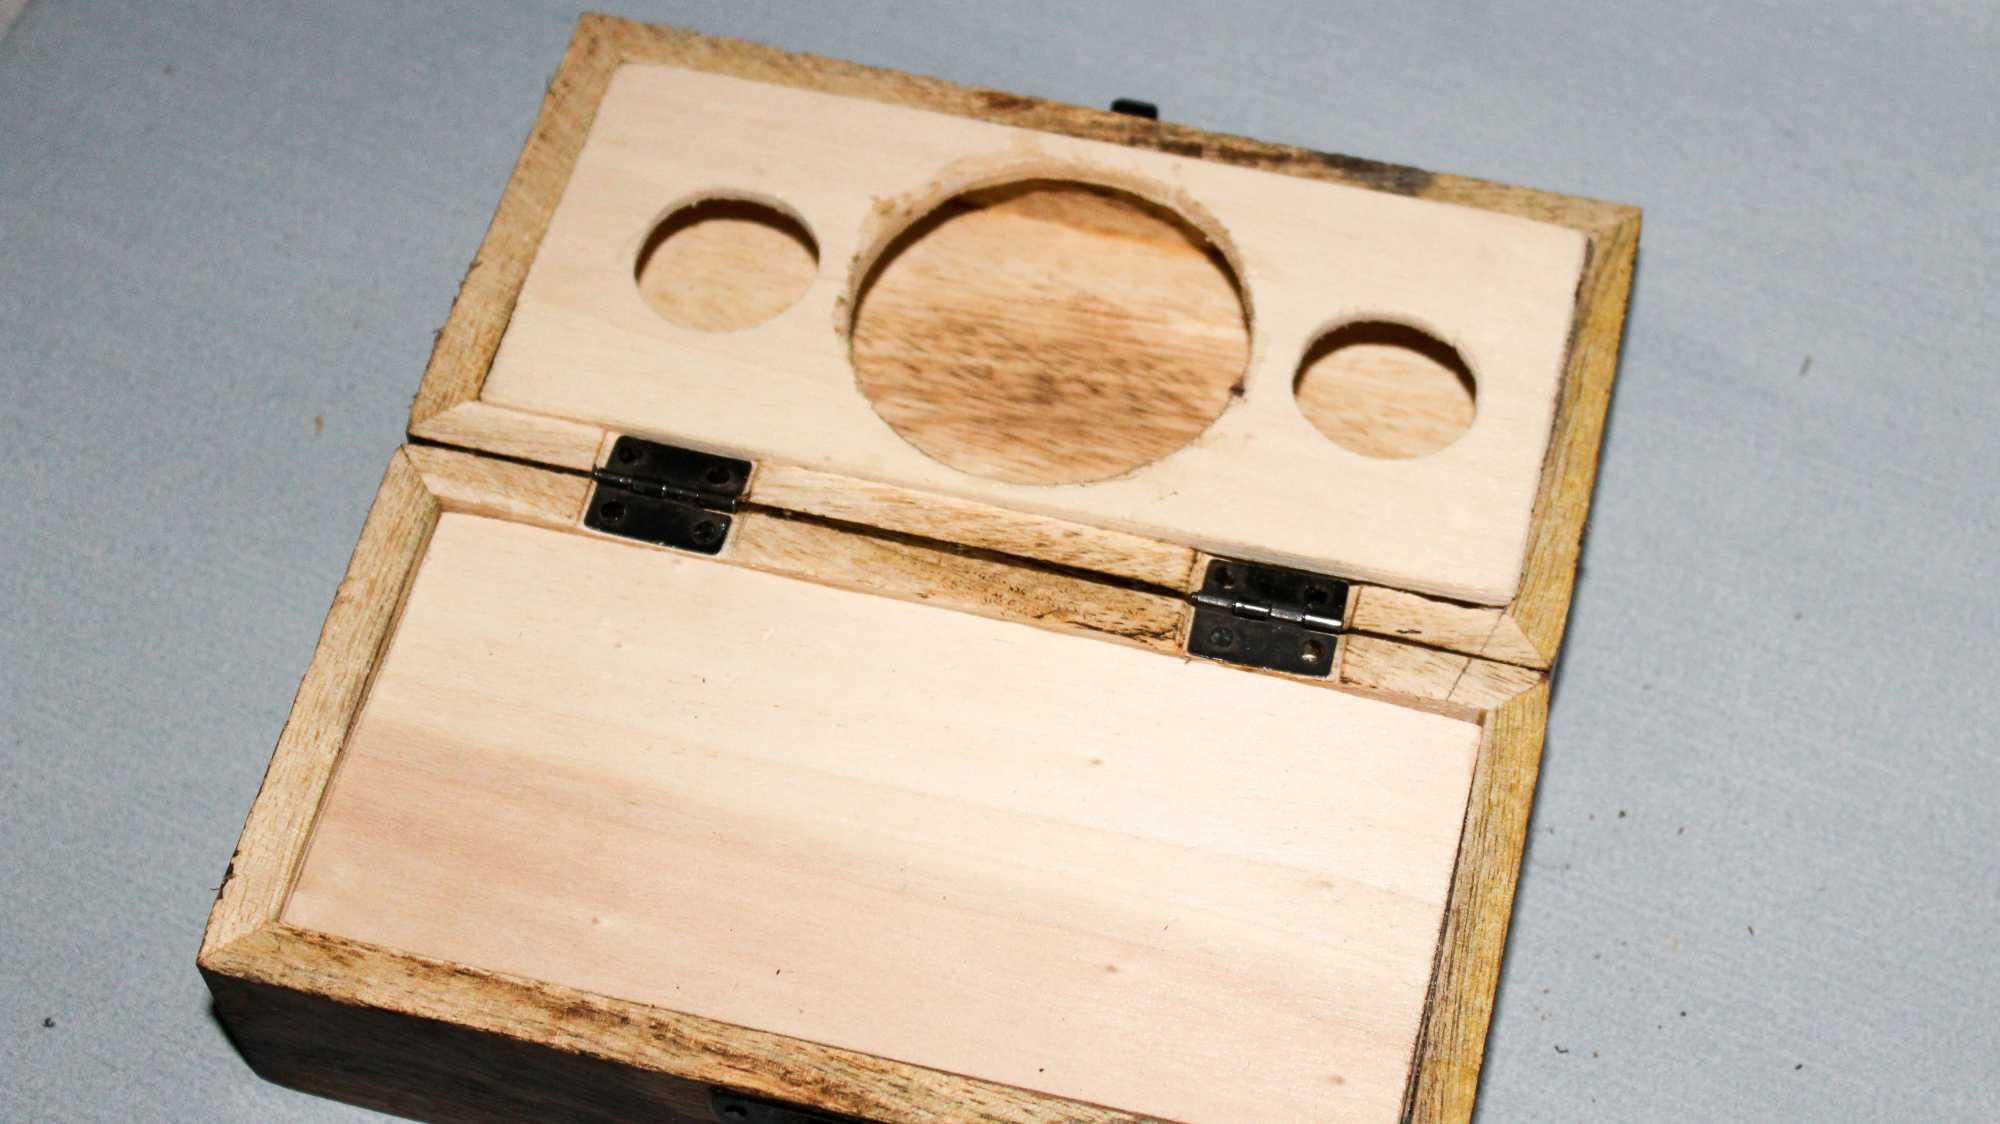 Holzplatten im Inneren des Audio-Adventskalenders